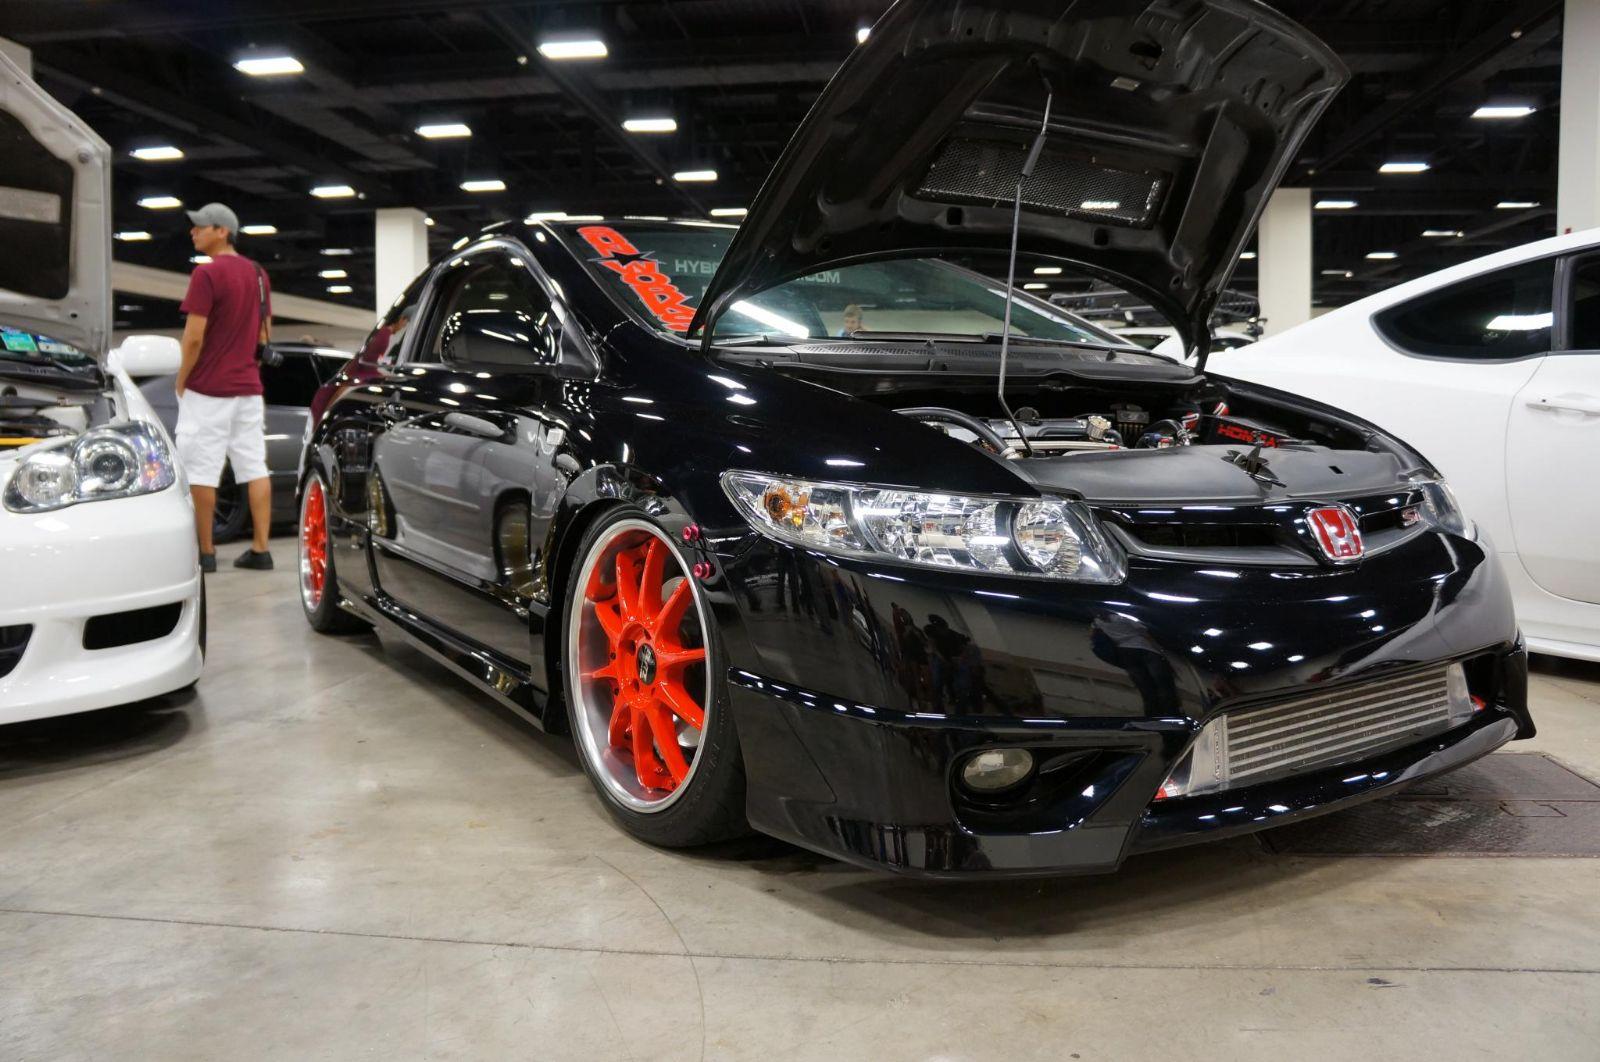 2007 Honda Civic Si For Sale